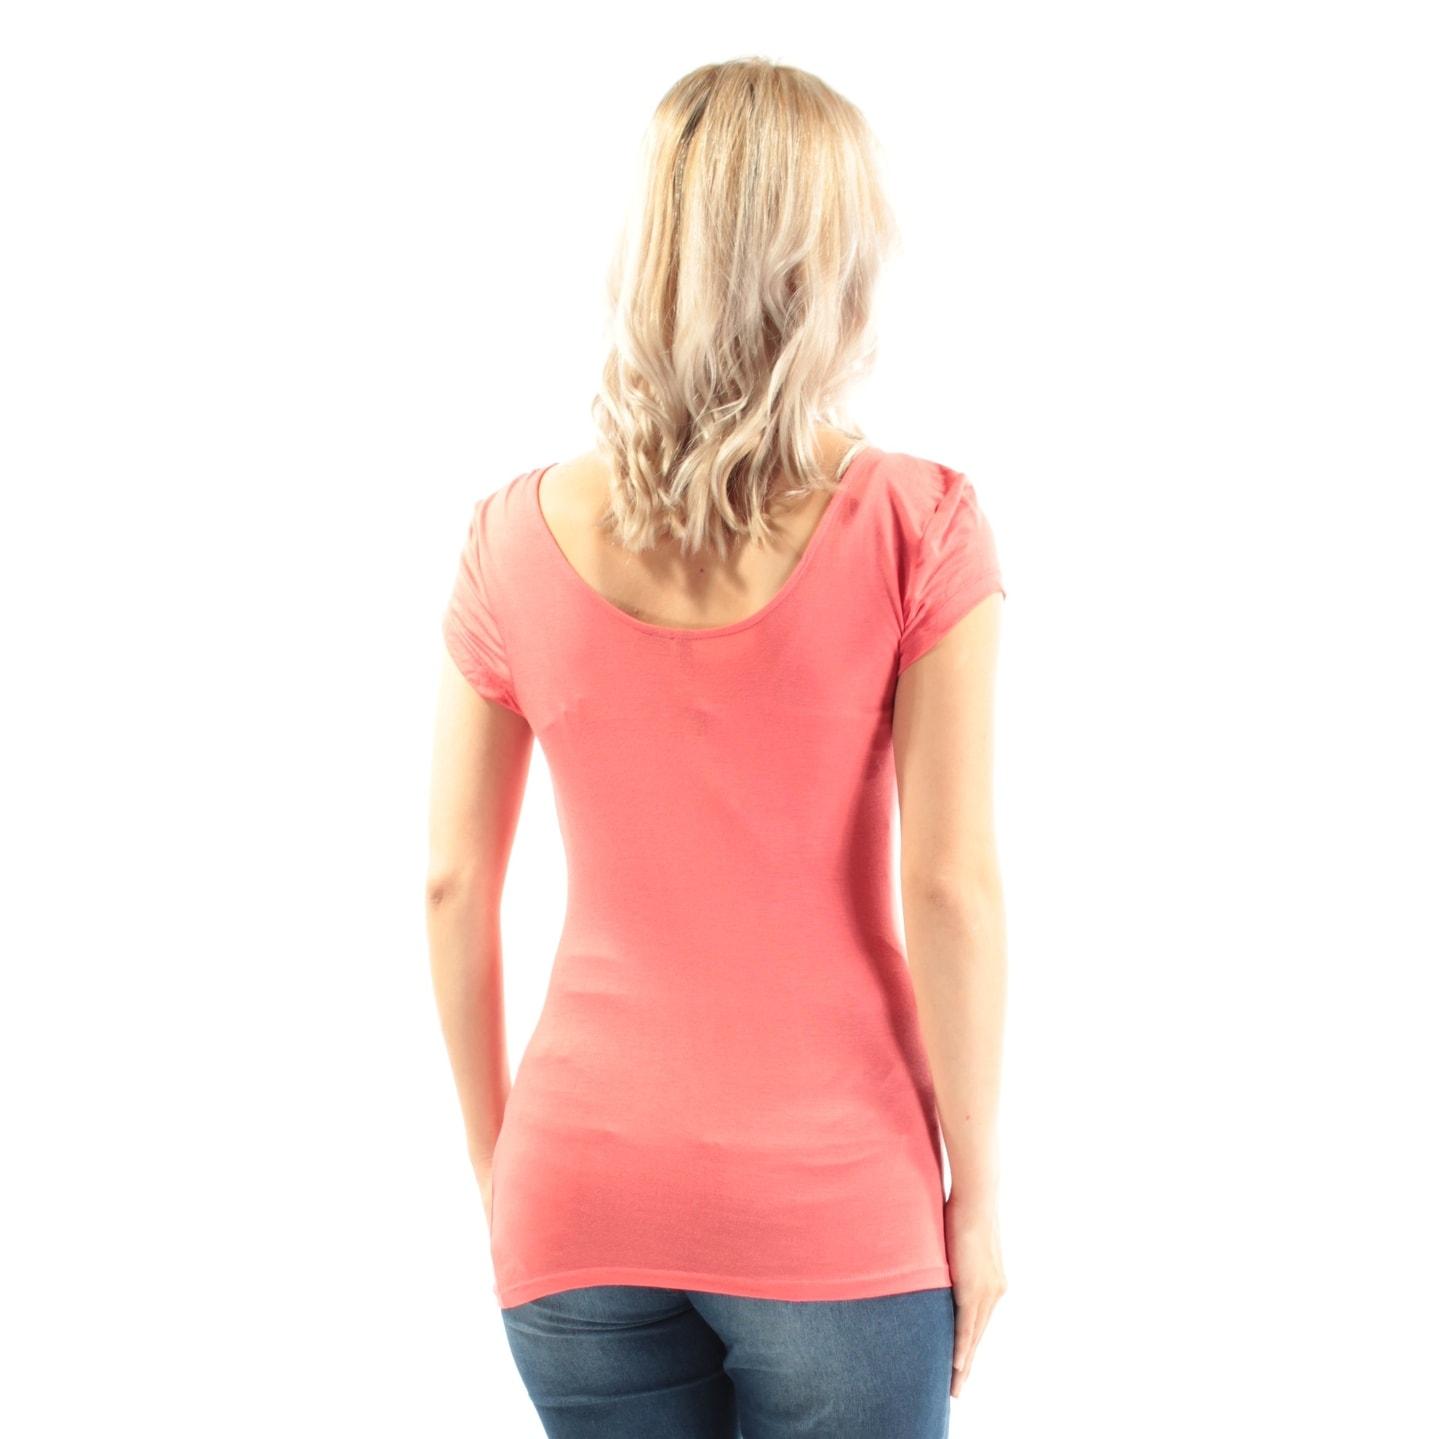 0a8cda4b87 Shop ULTRA FLIRT  13 Womens New 3414 Coral Short Sleeve T-Shirt S Juniors  B+B - Free Shipping On Orders Over  45 - Overstock.com - 21350691